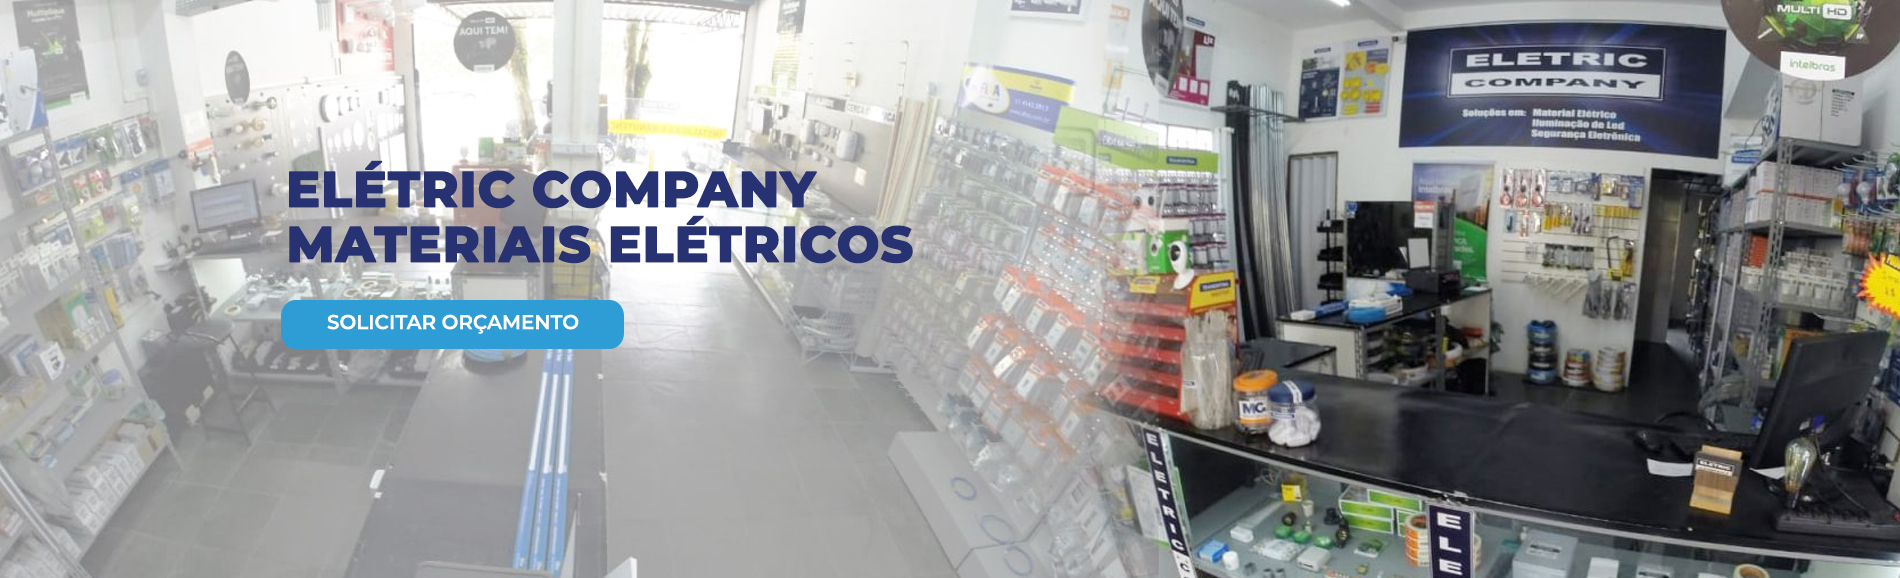 banner-eletric-company